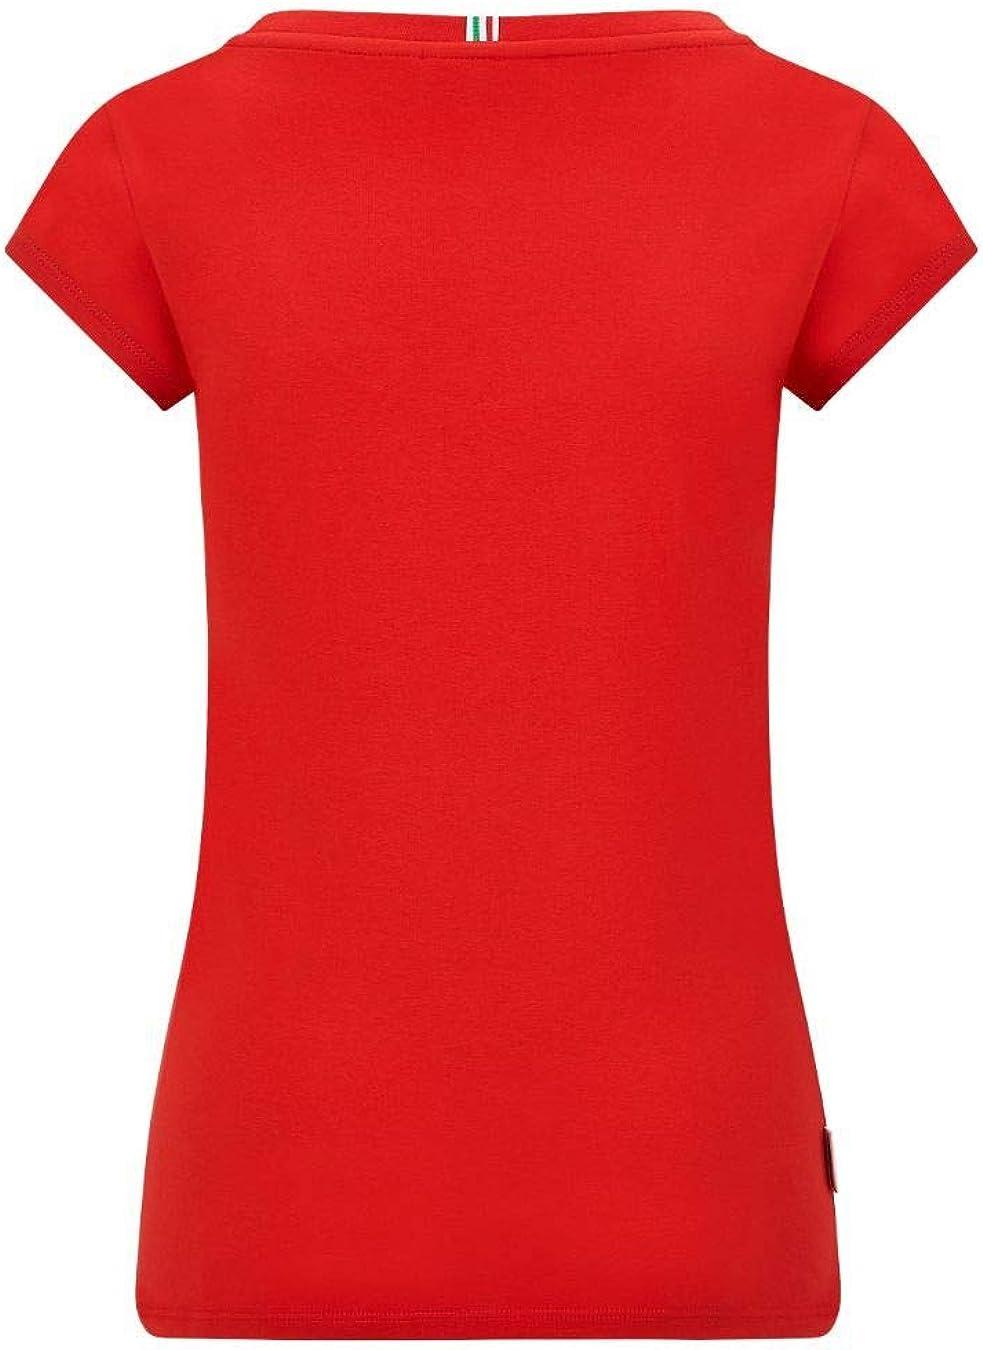 Ferrari Scuderia Team Motorsport F1 Offizielles Formel 1 Damen T-Shirt S. Rot